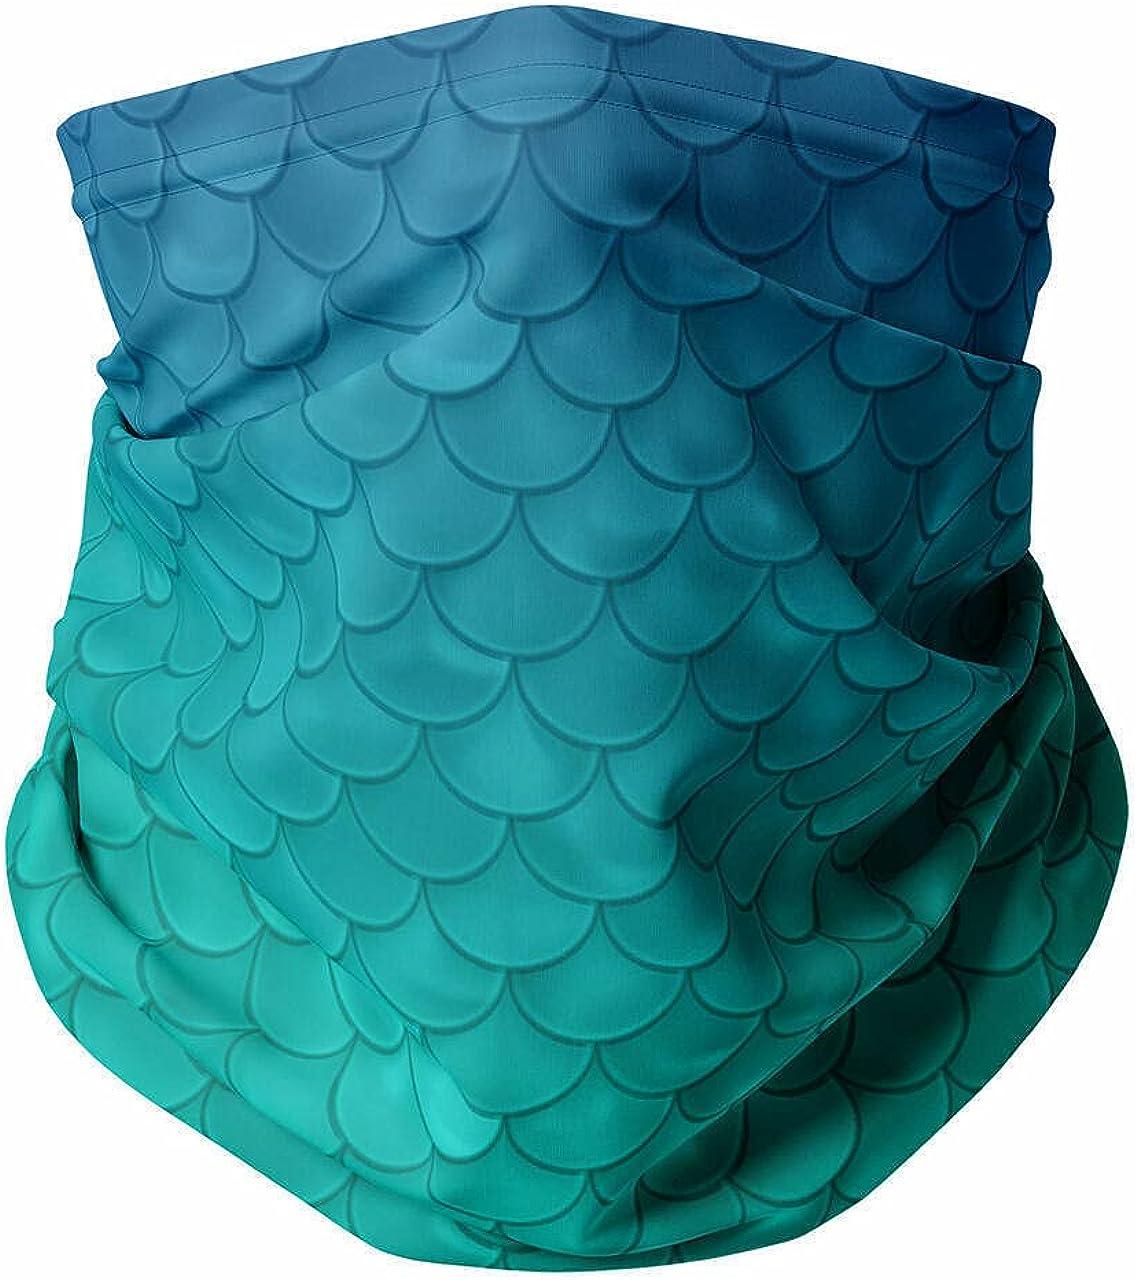 Neck Gaiter Face Covering - Ariel Mermaid Inspired